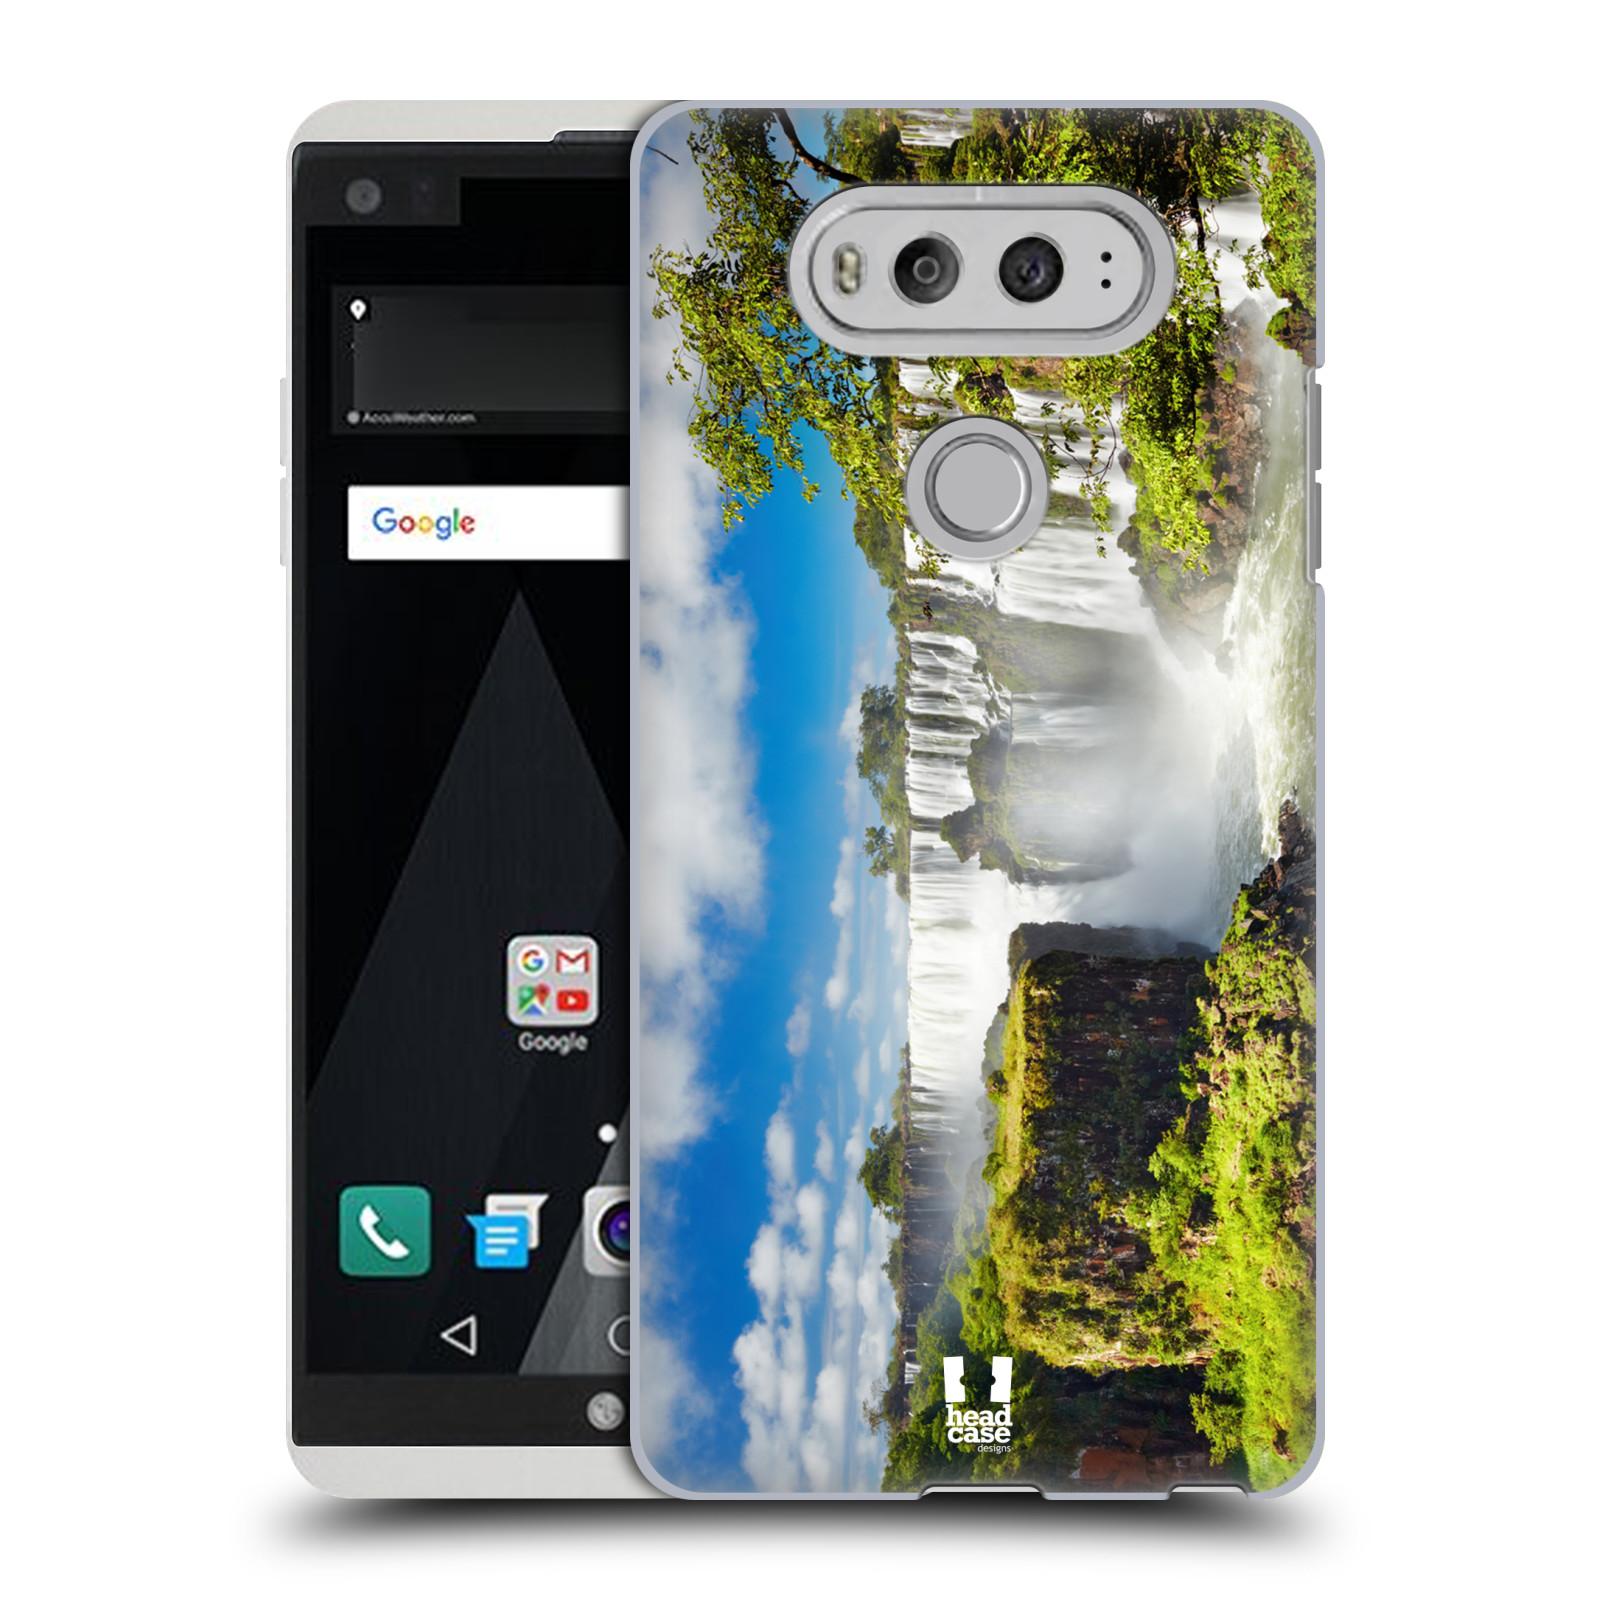 Case Designs famosos monumentos duro HEAD volver estuche para LG V20